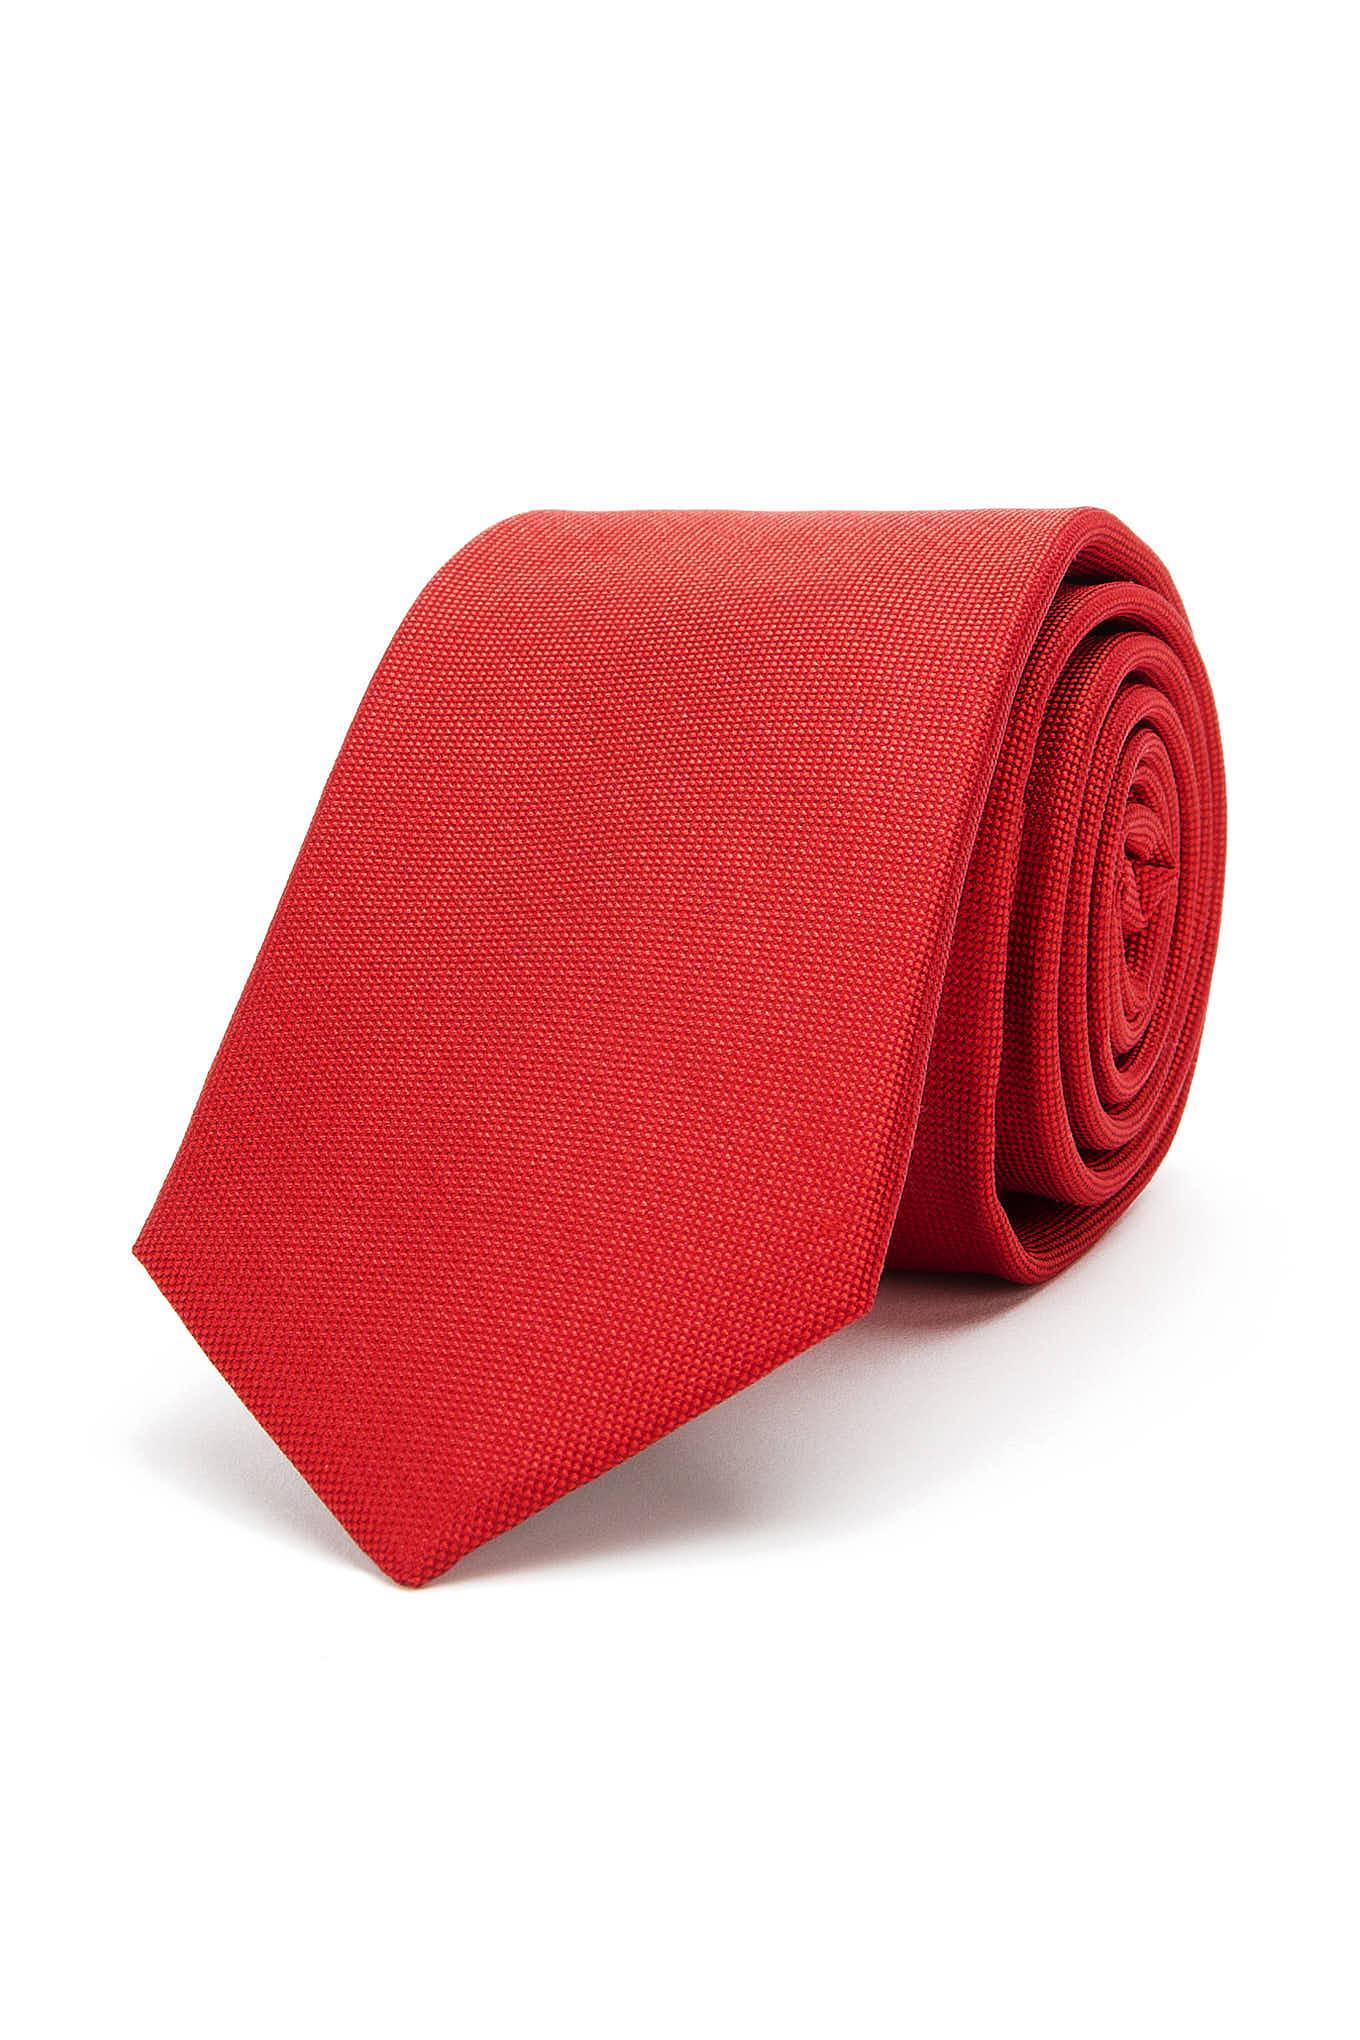 Tie Red Classic Boy